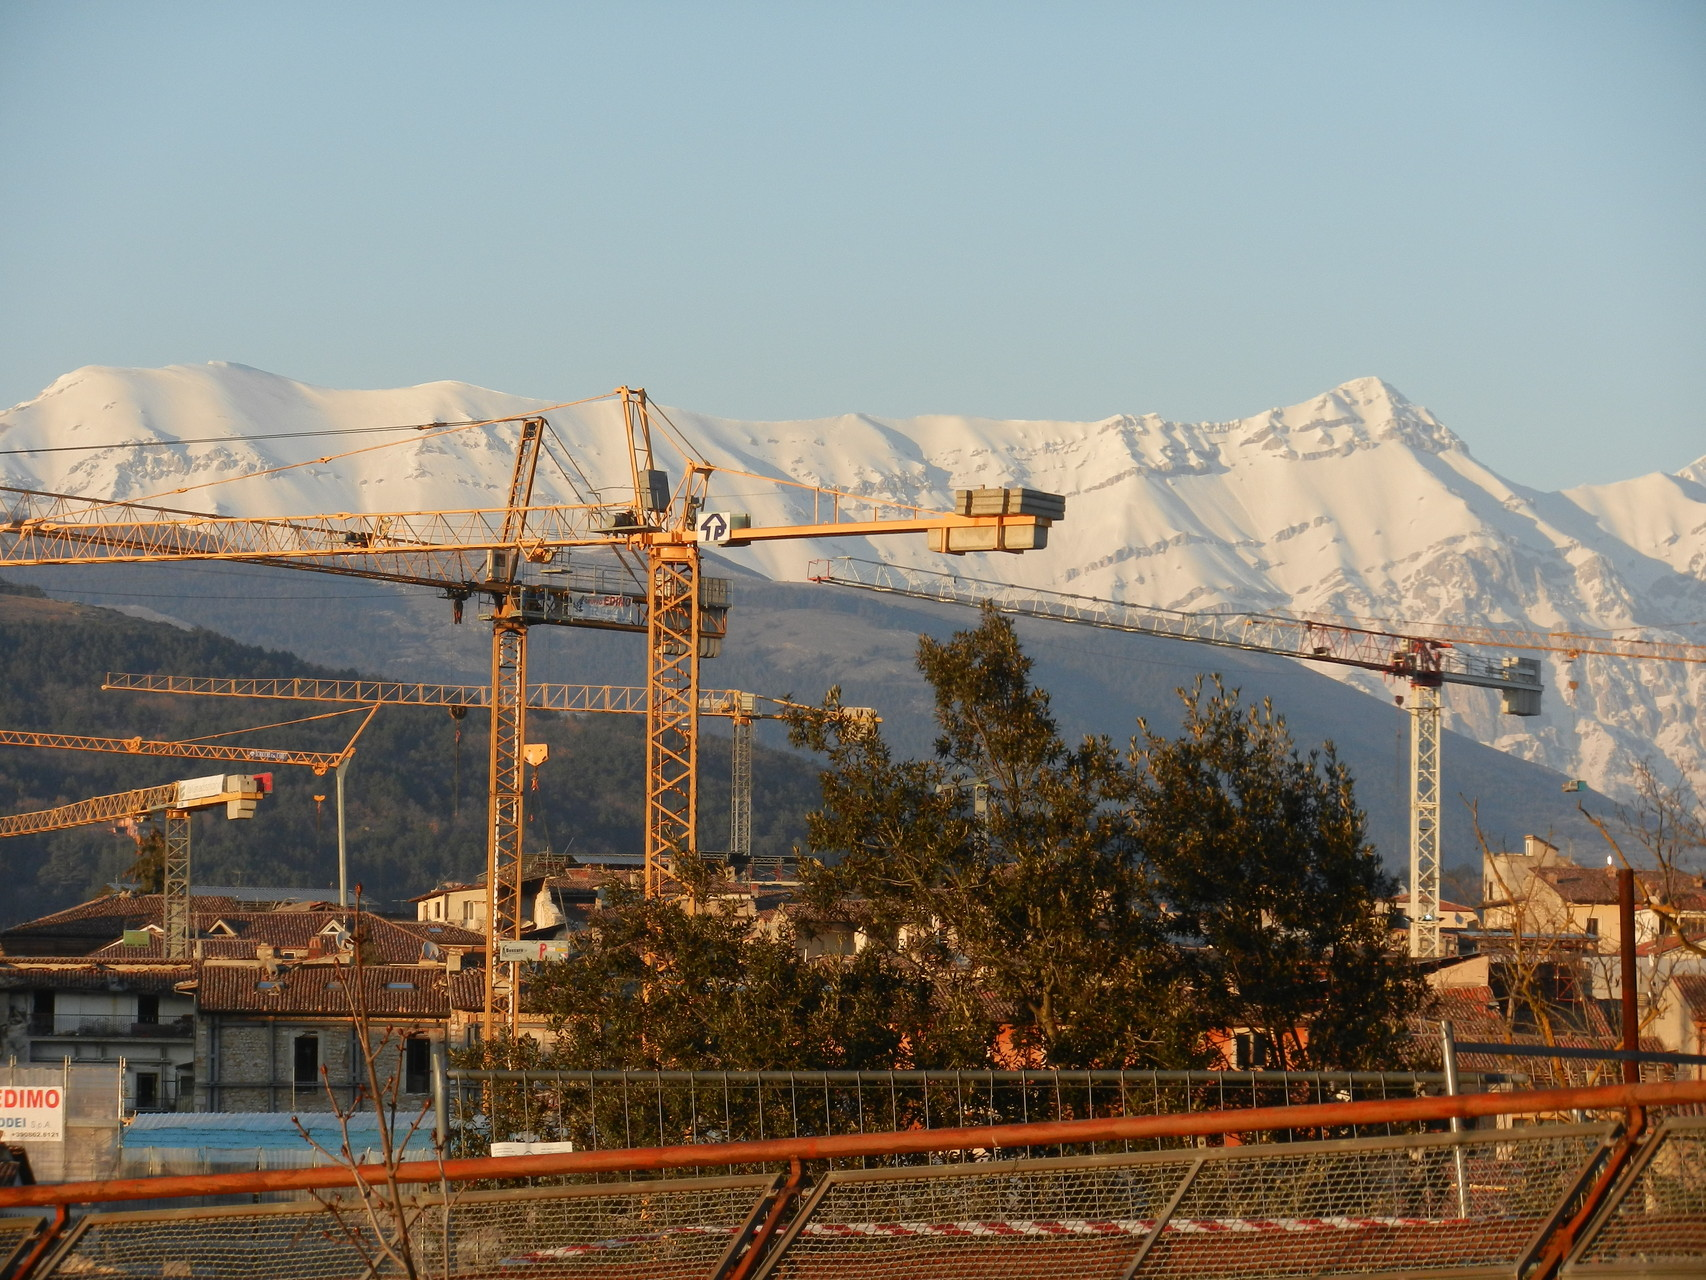 L'Aquila- Aprile 2014, Panorama con gru.